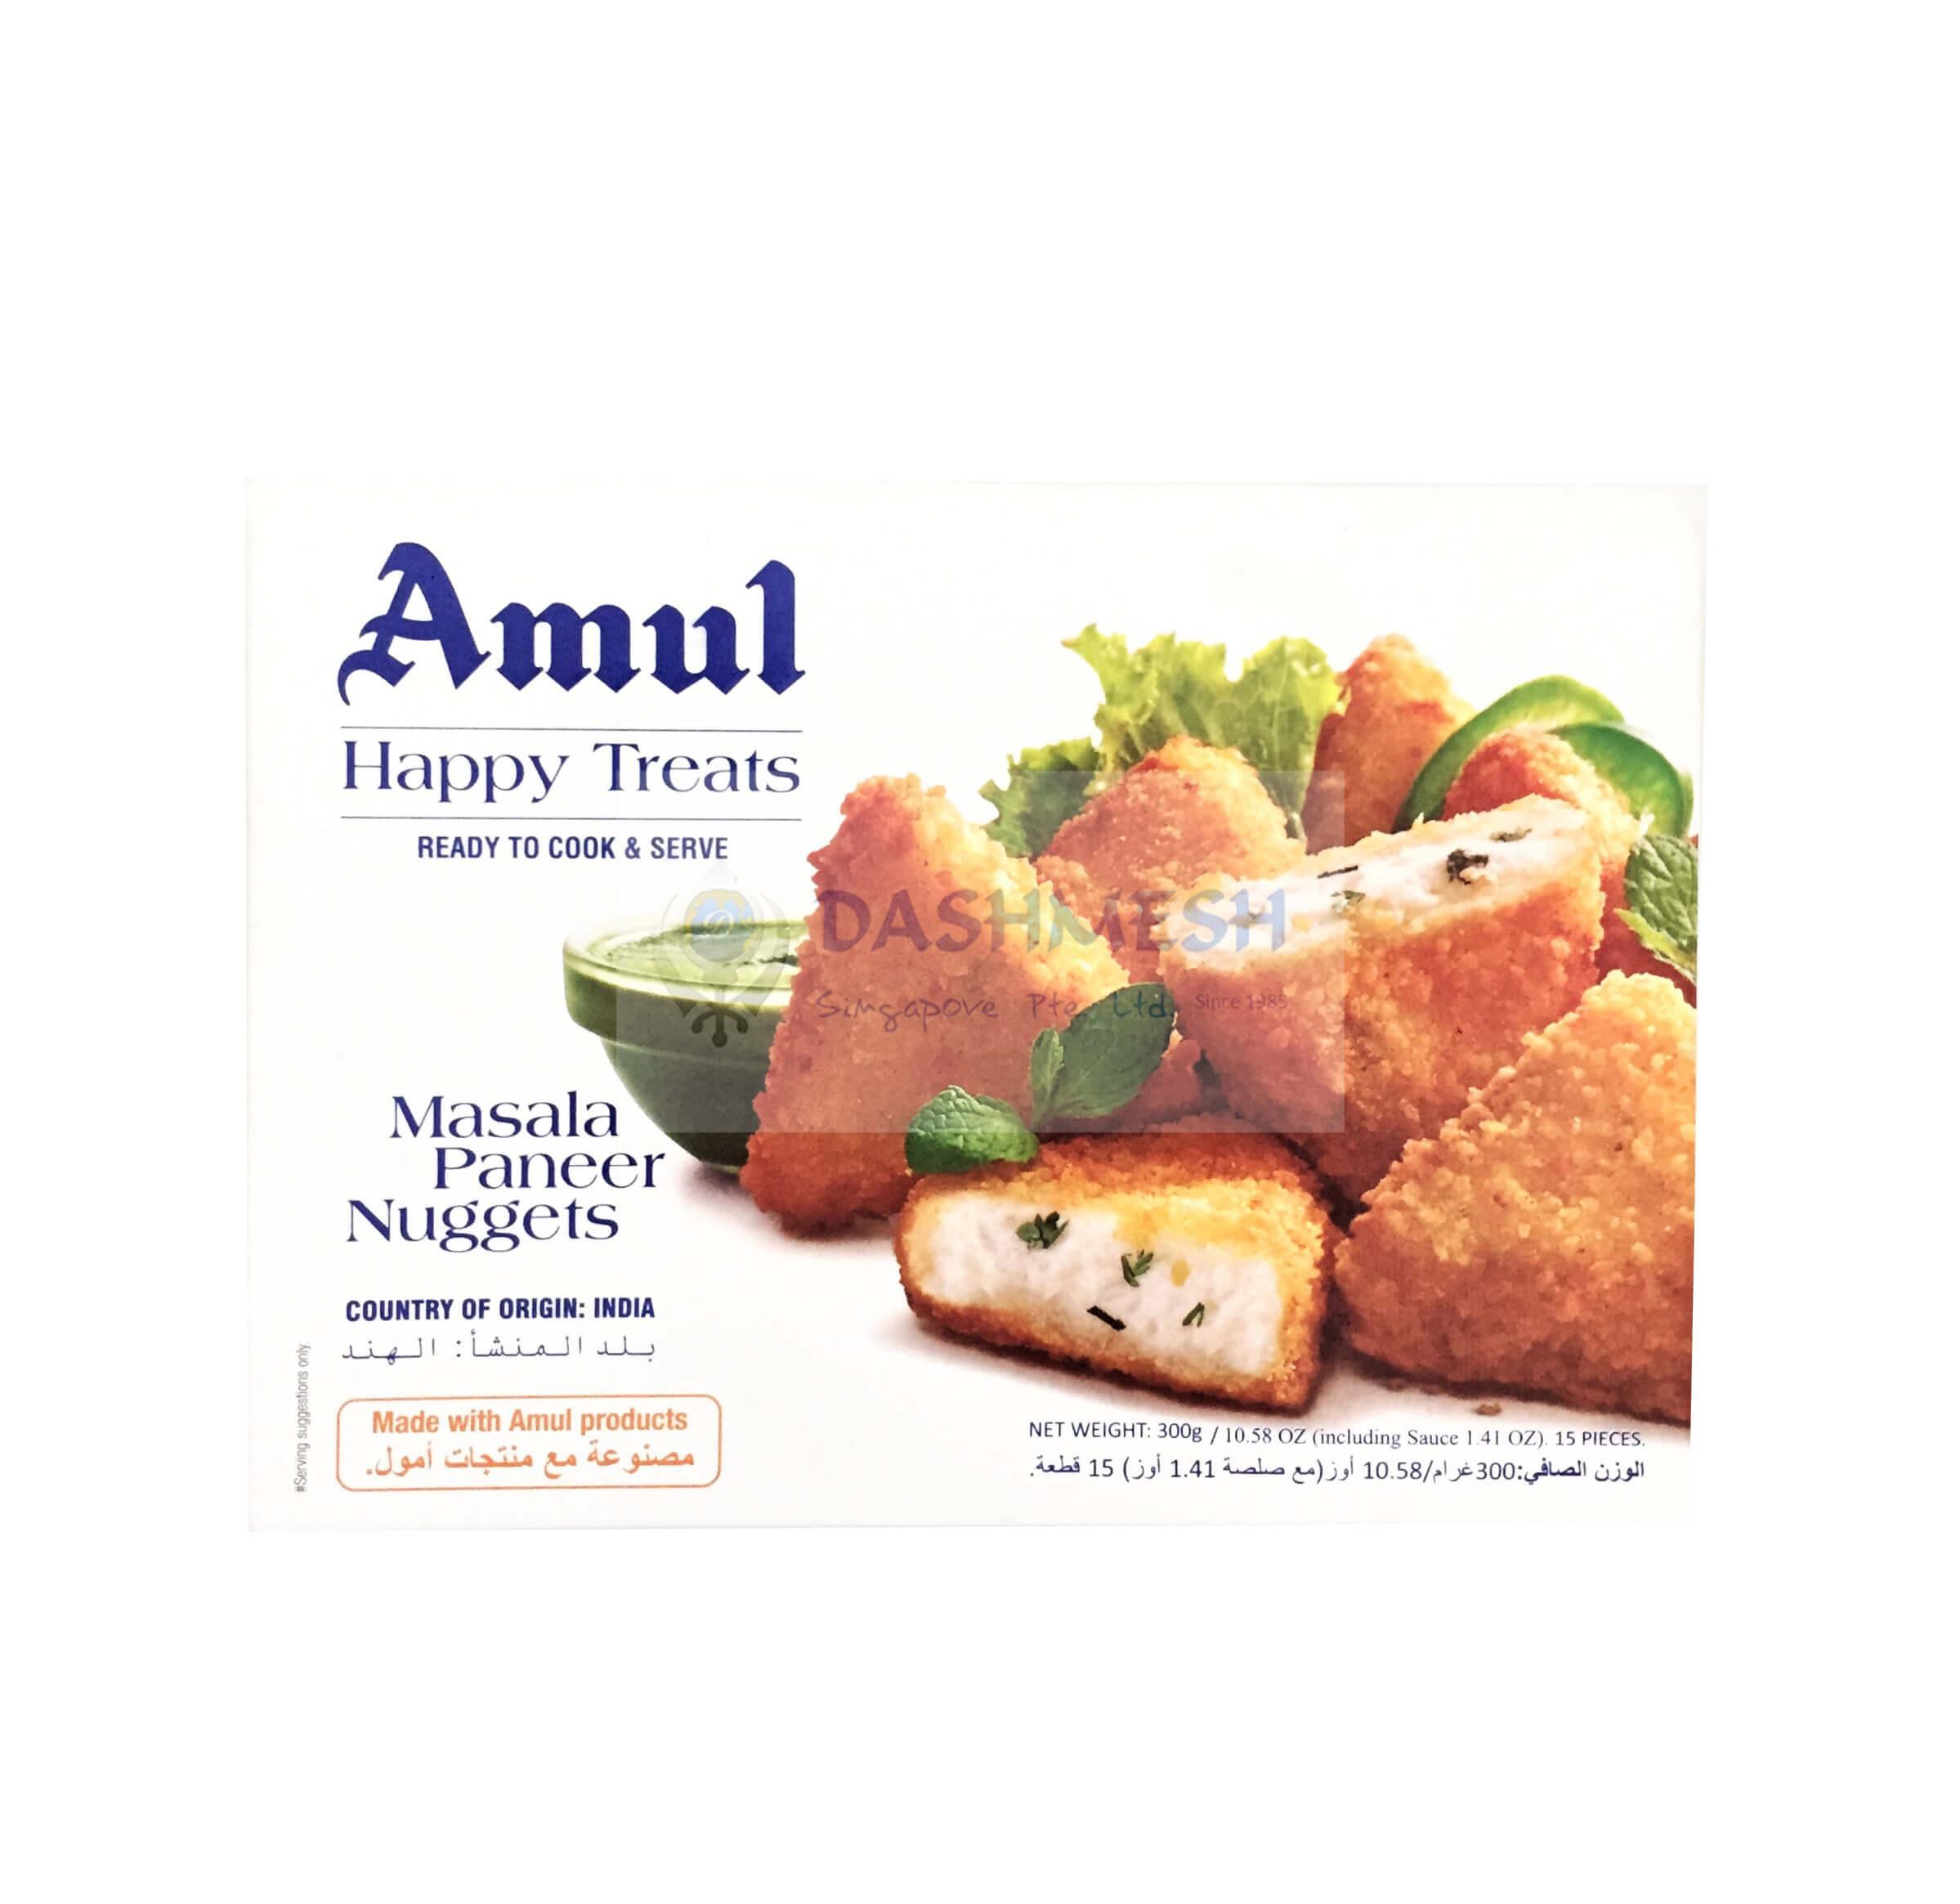 Amul Masala Paneer Nuggets 300g